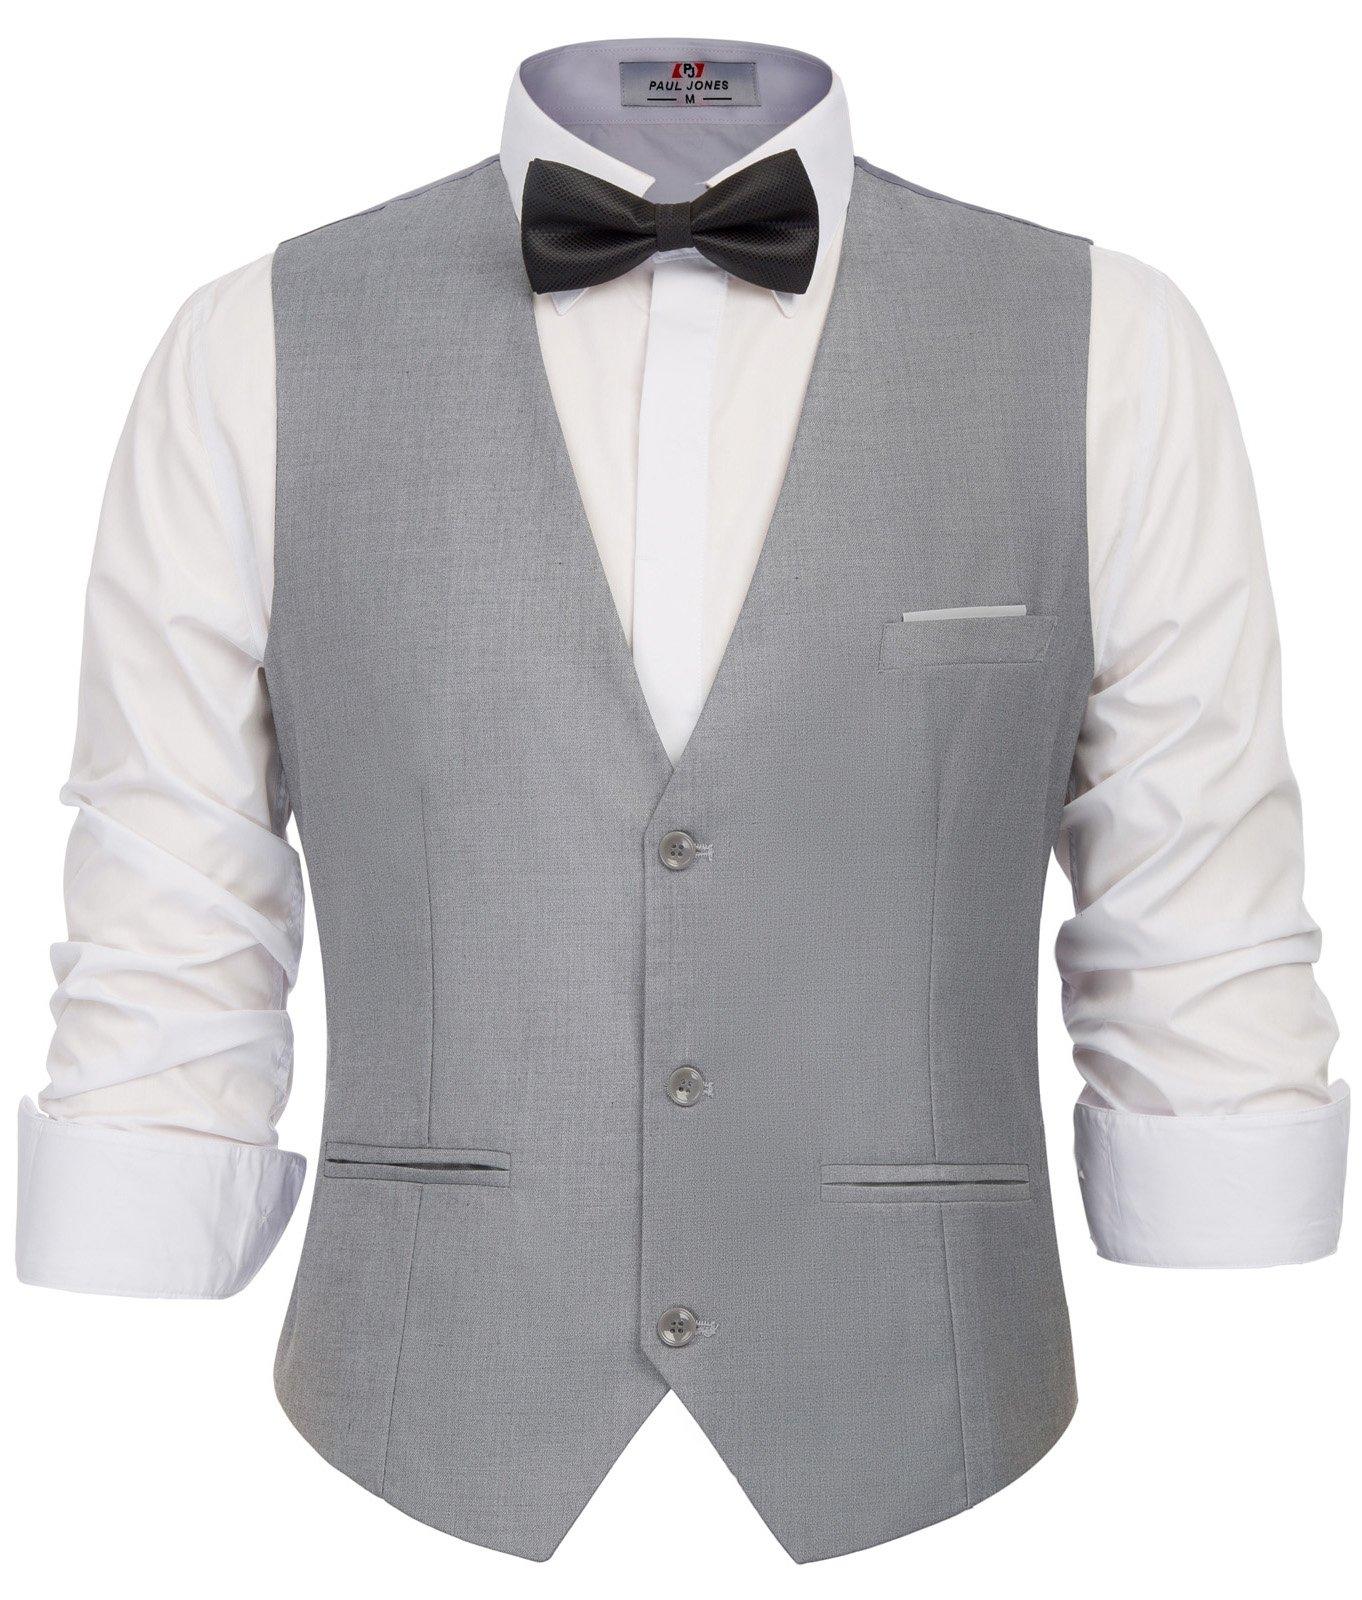 PAUL JONES Men's V-Neck Sleeveless Slim Fit Jacket Grey Casual Suit Vests